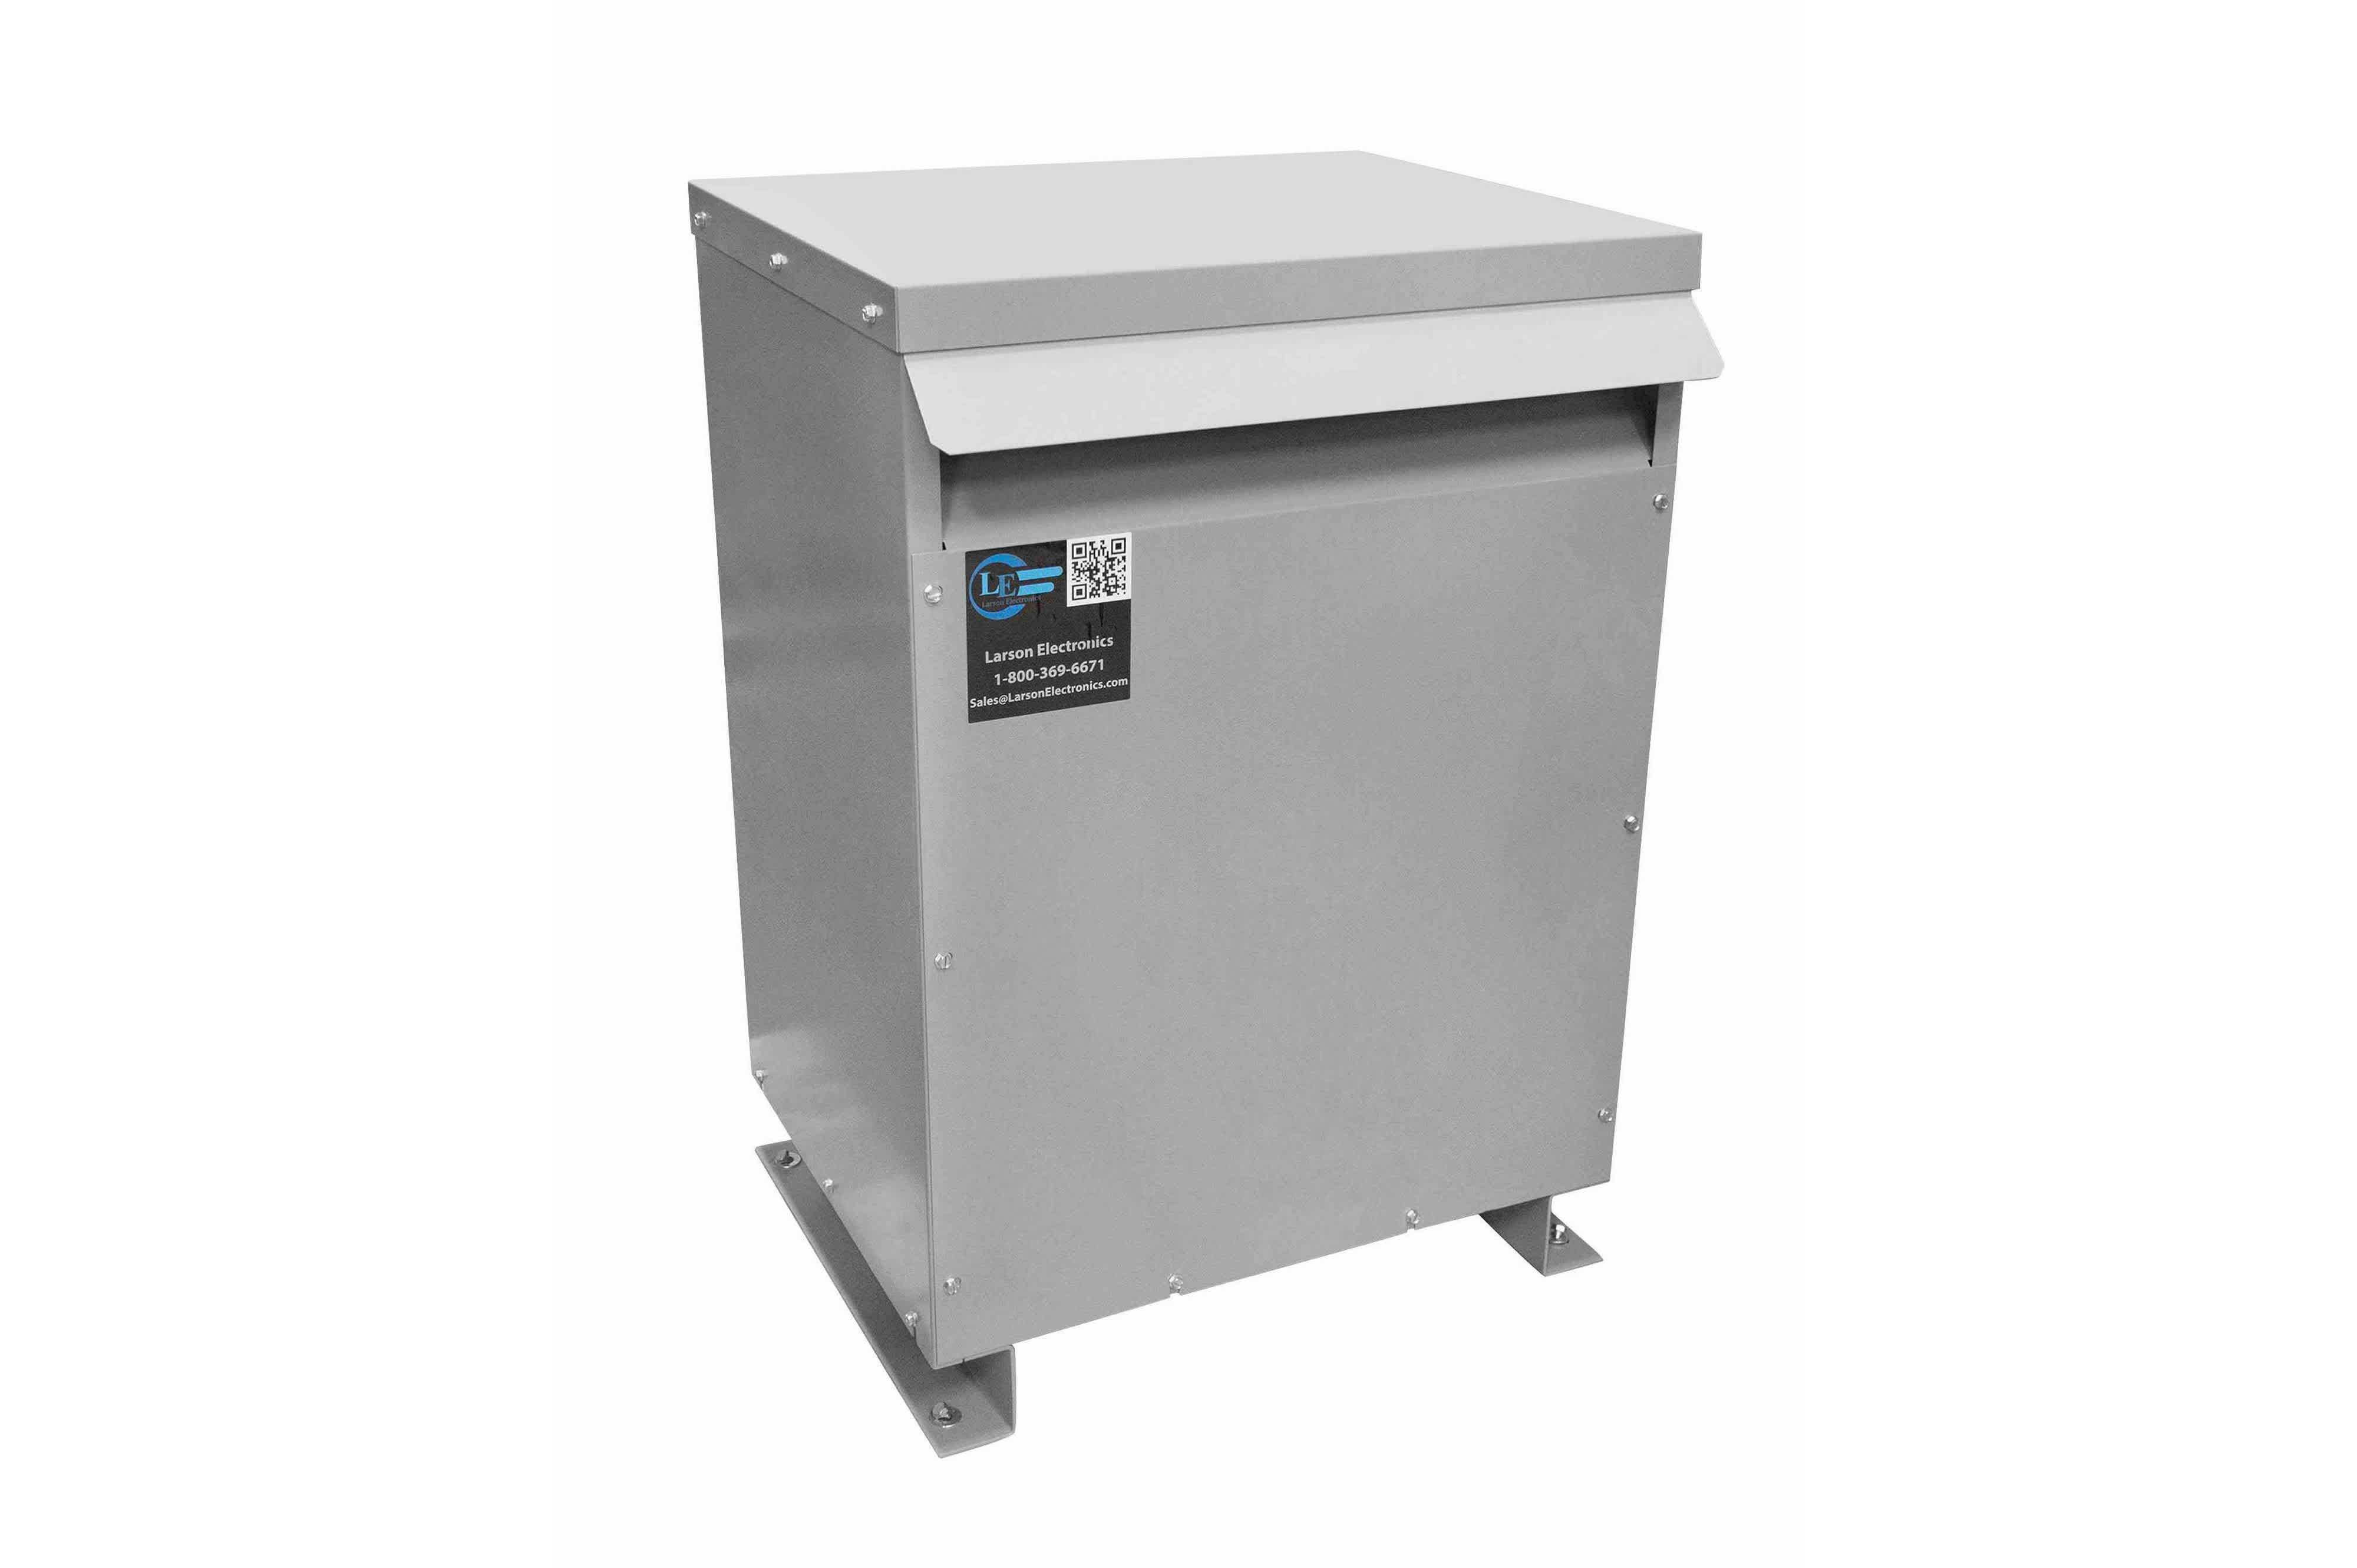 250 kVA 3PH DOE Transformer, 240V Delta Primary, 480Y/277 Wye-N Secondary, N3R, Ventilated, 60 Hz